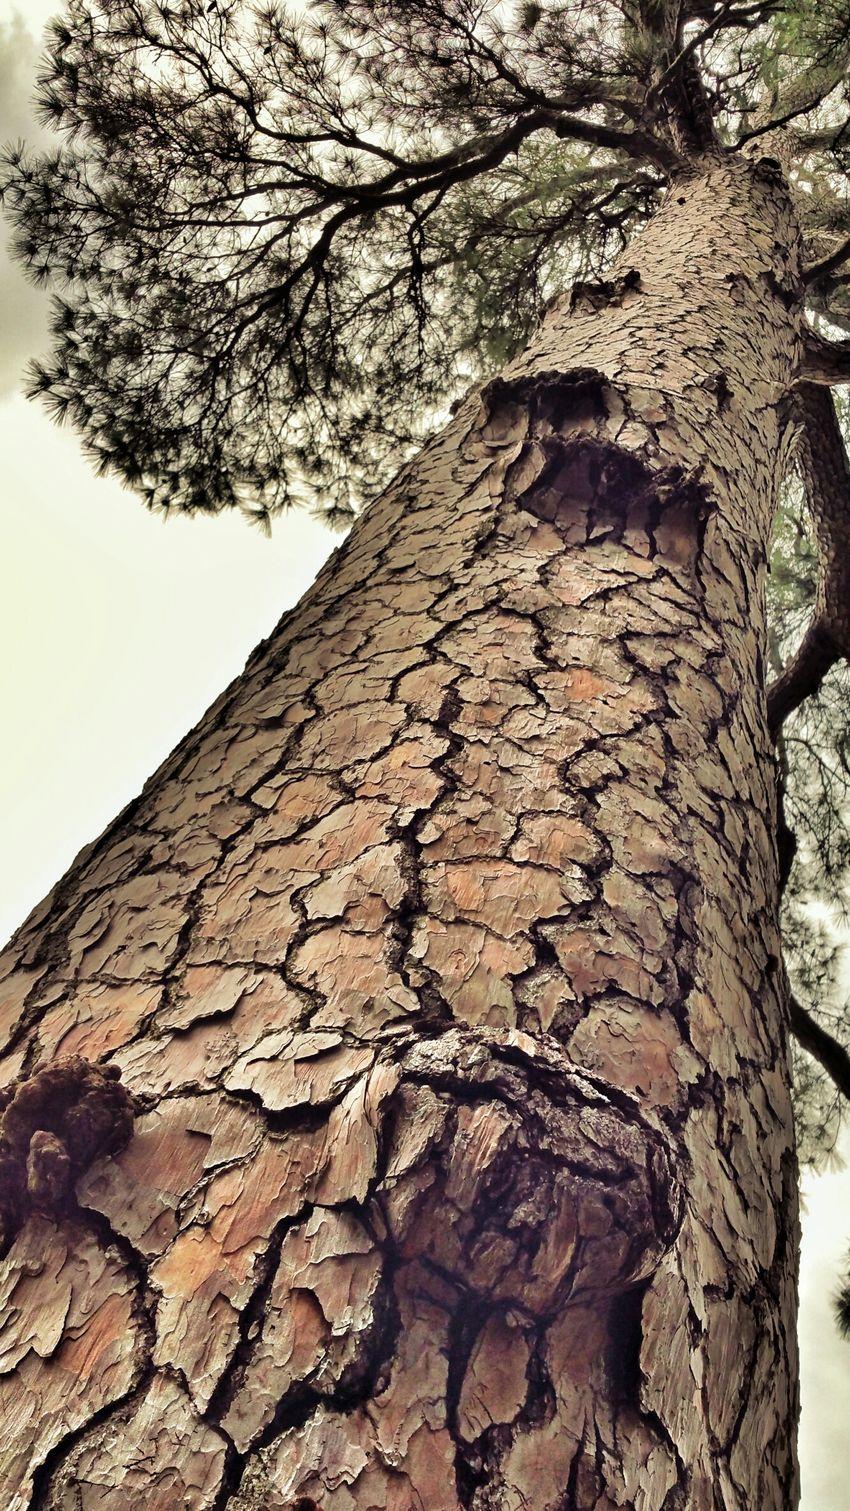 Taking Photos Lovemyfilters Walking Around Sun And Trees Backyard Hugging A Tree Tree Bark Nature Textures